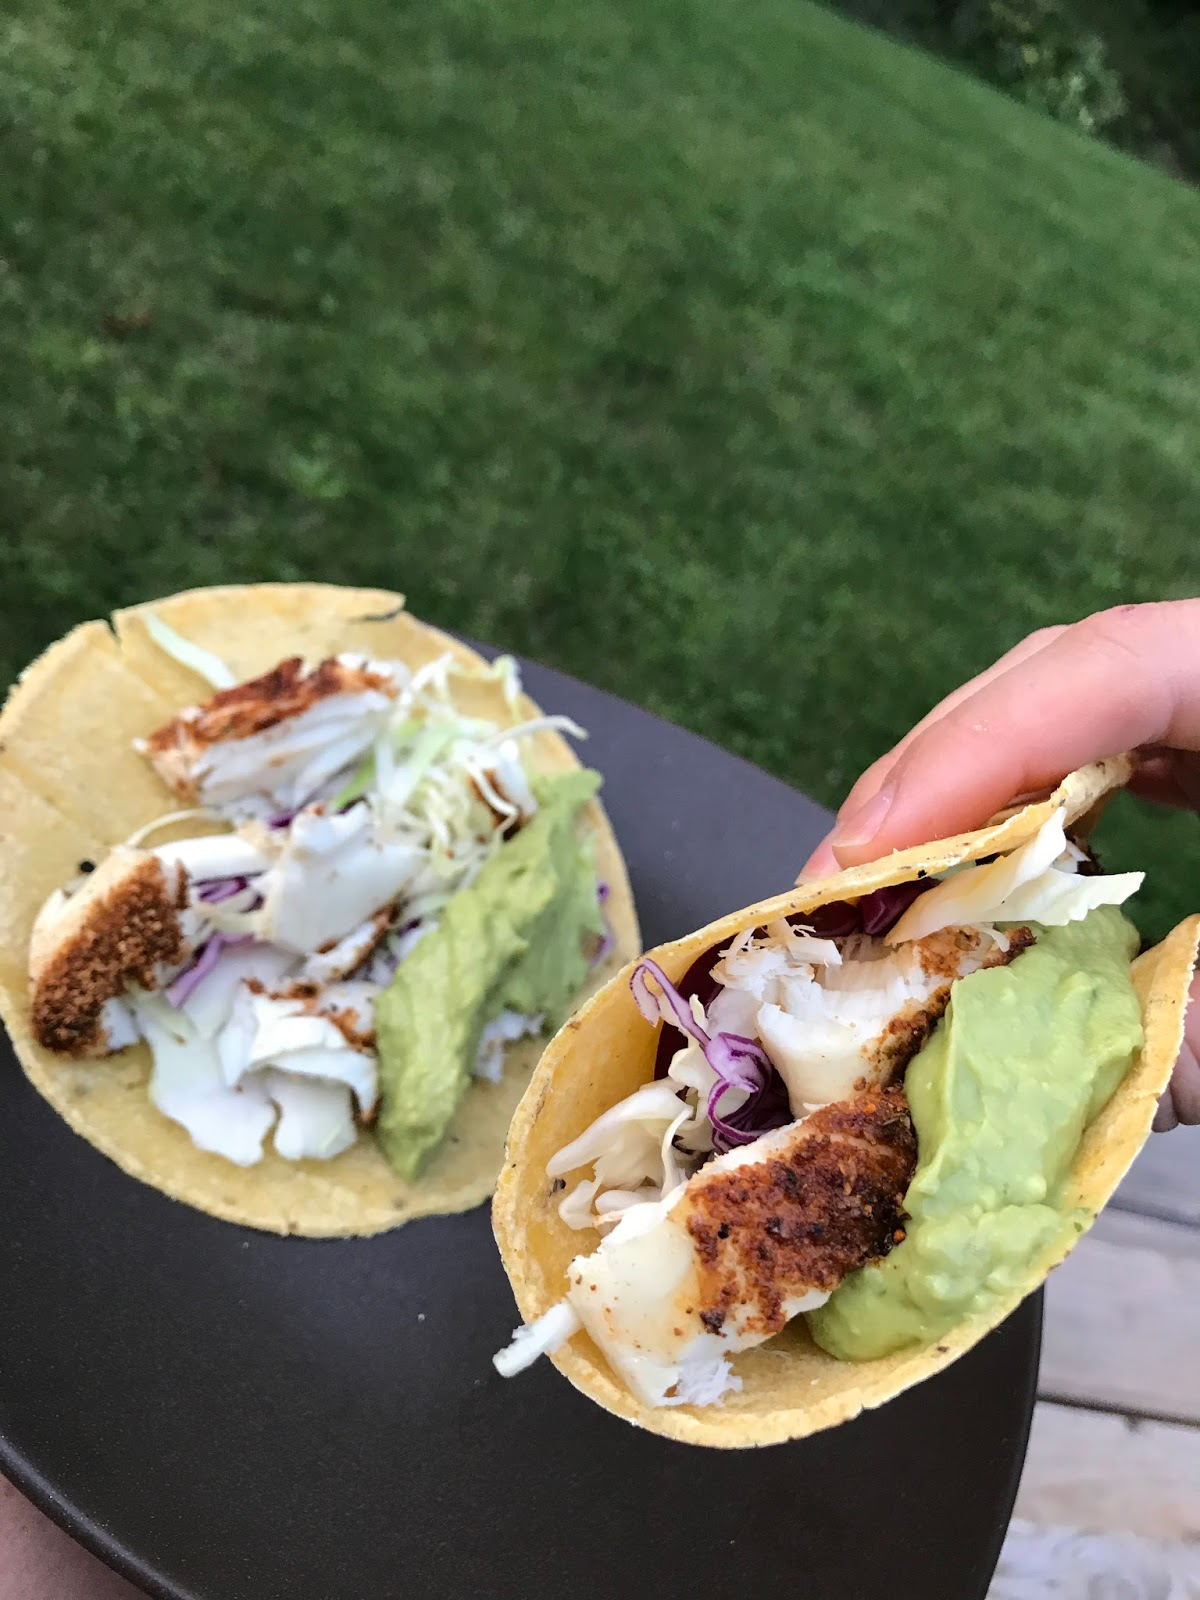 Wild game wild gains alaskan halibut fish tacos for Halibut fish tacos